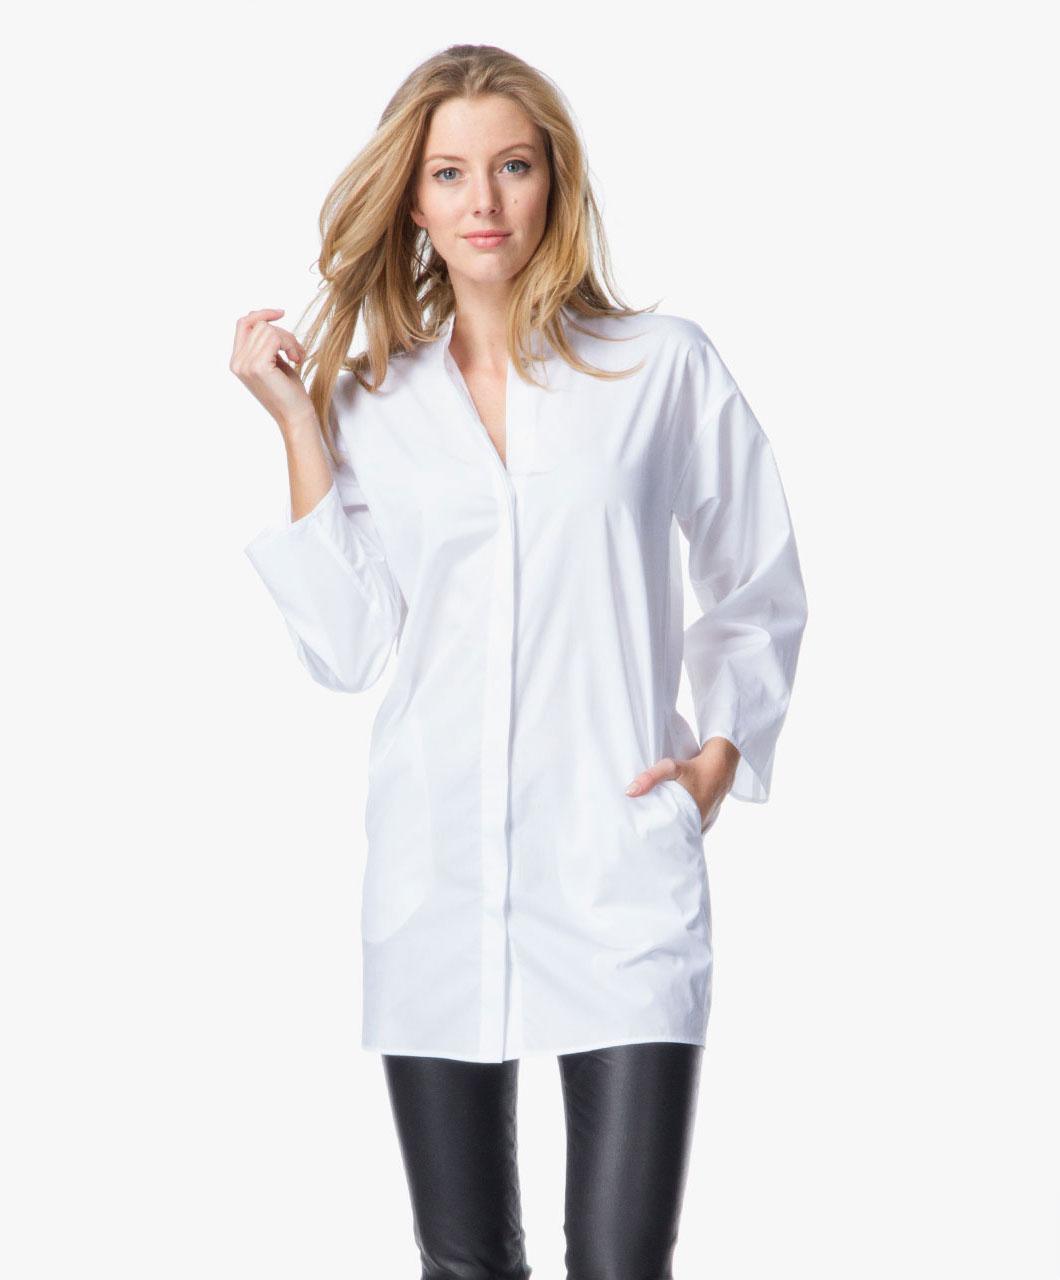 Cotton Tunic Blouse 11